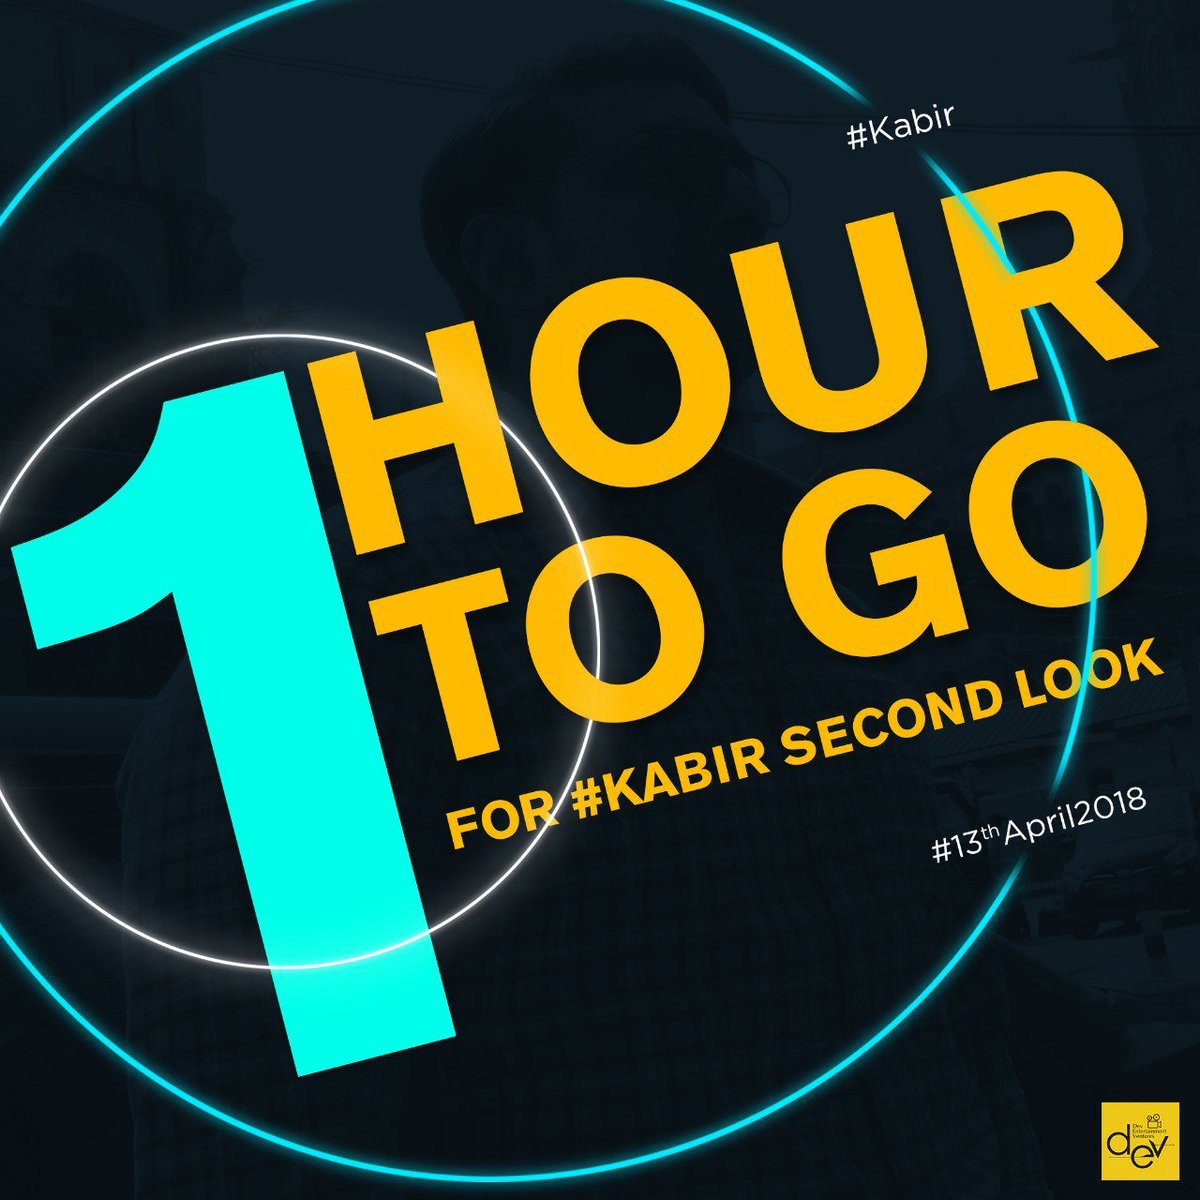 Just 1 hour to go. Keep eyes on our Social Media Pages for the Exclusive #KABIR 2nd Look.  @idevadhikari, @RukminiMaitra, @aniket9163, @iindraadip, @DEV_PvtLtd.  #PeaceHasAPrice #April2018.